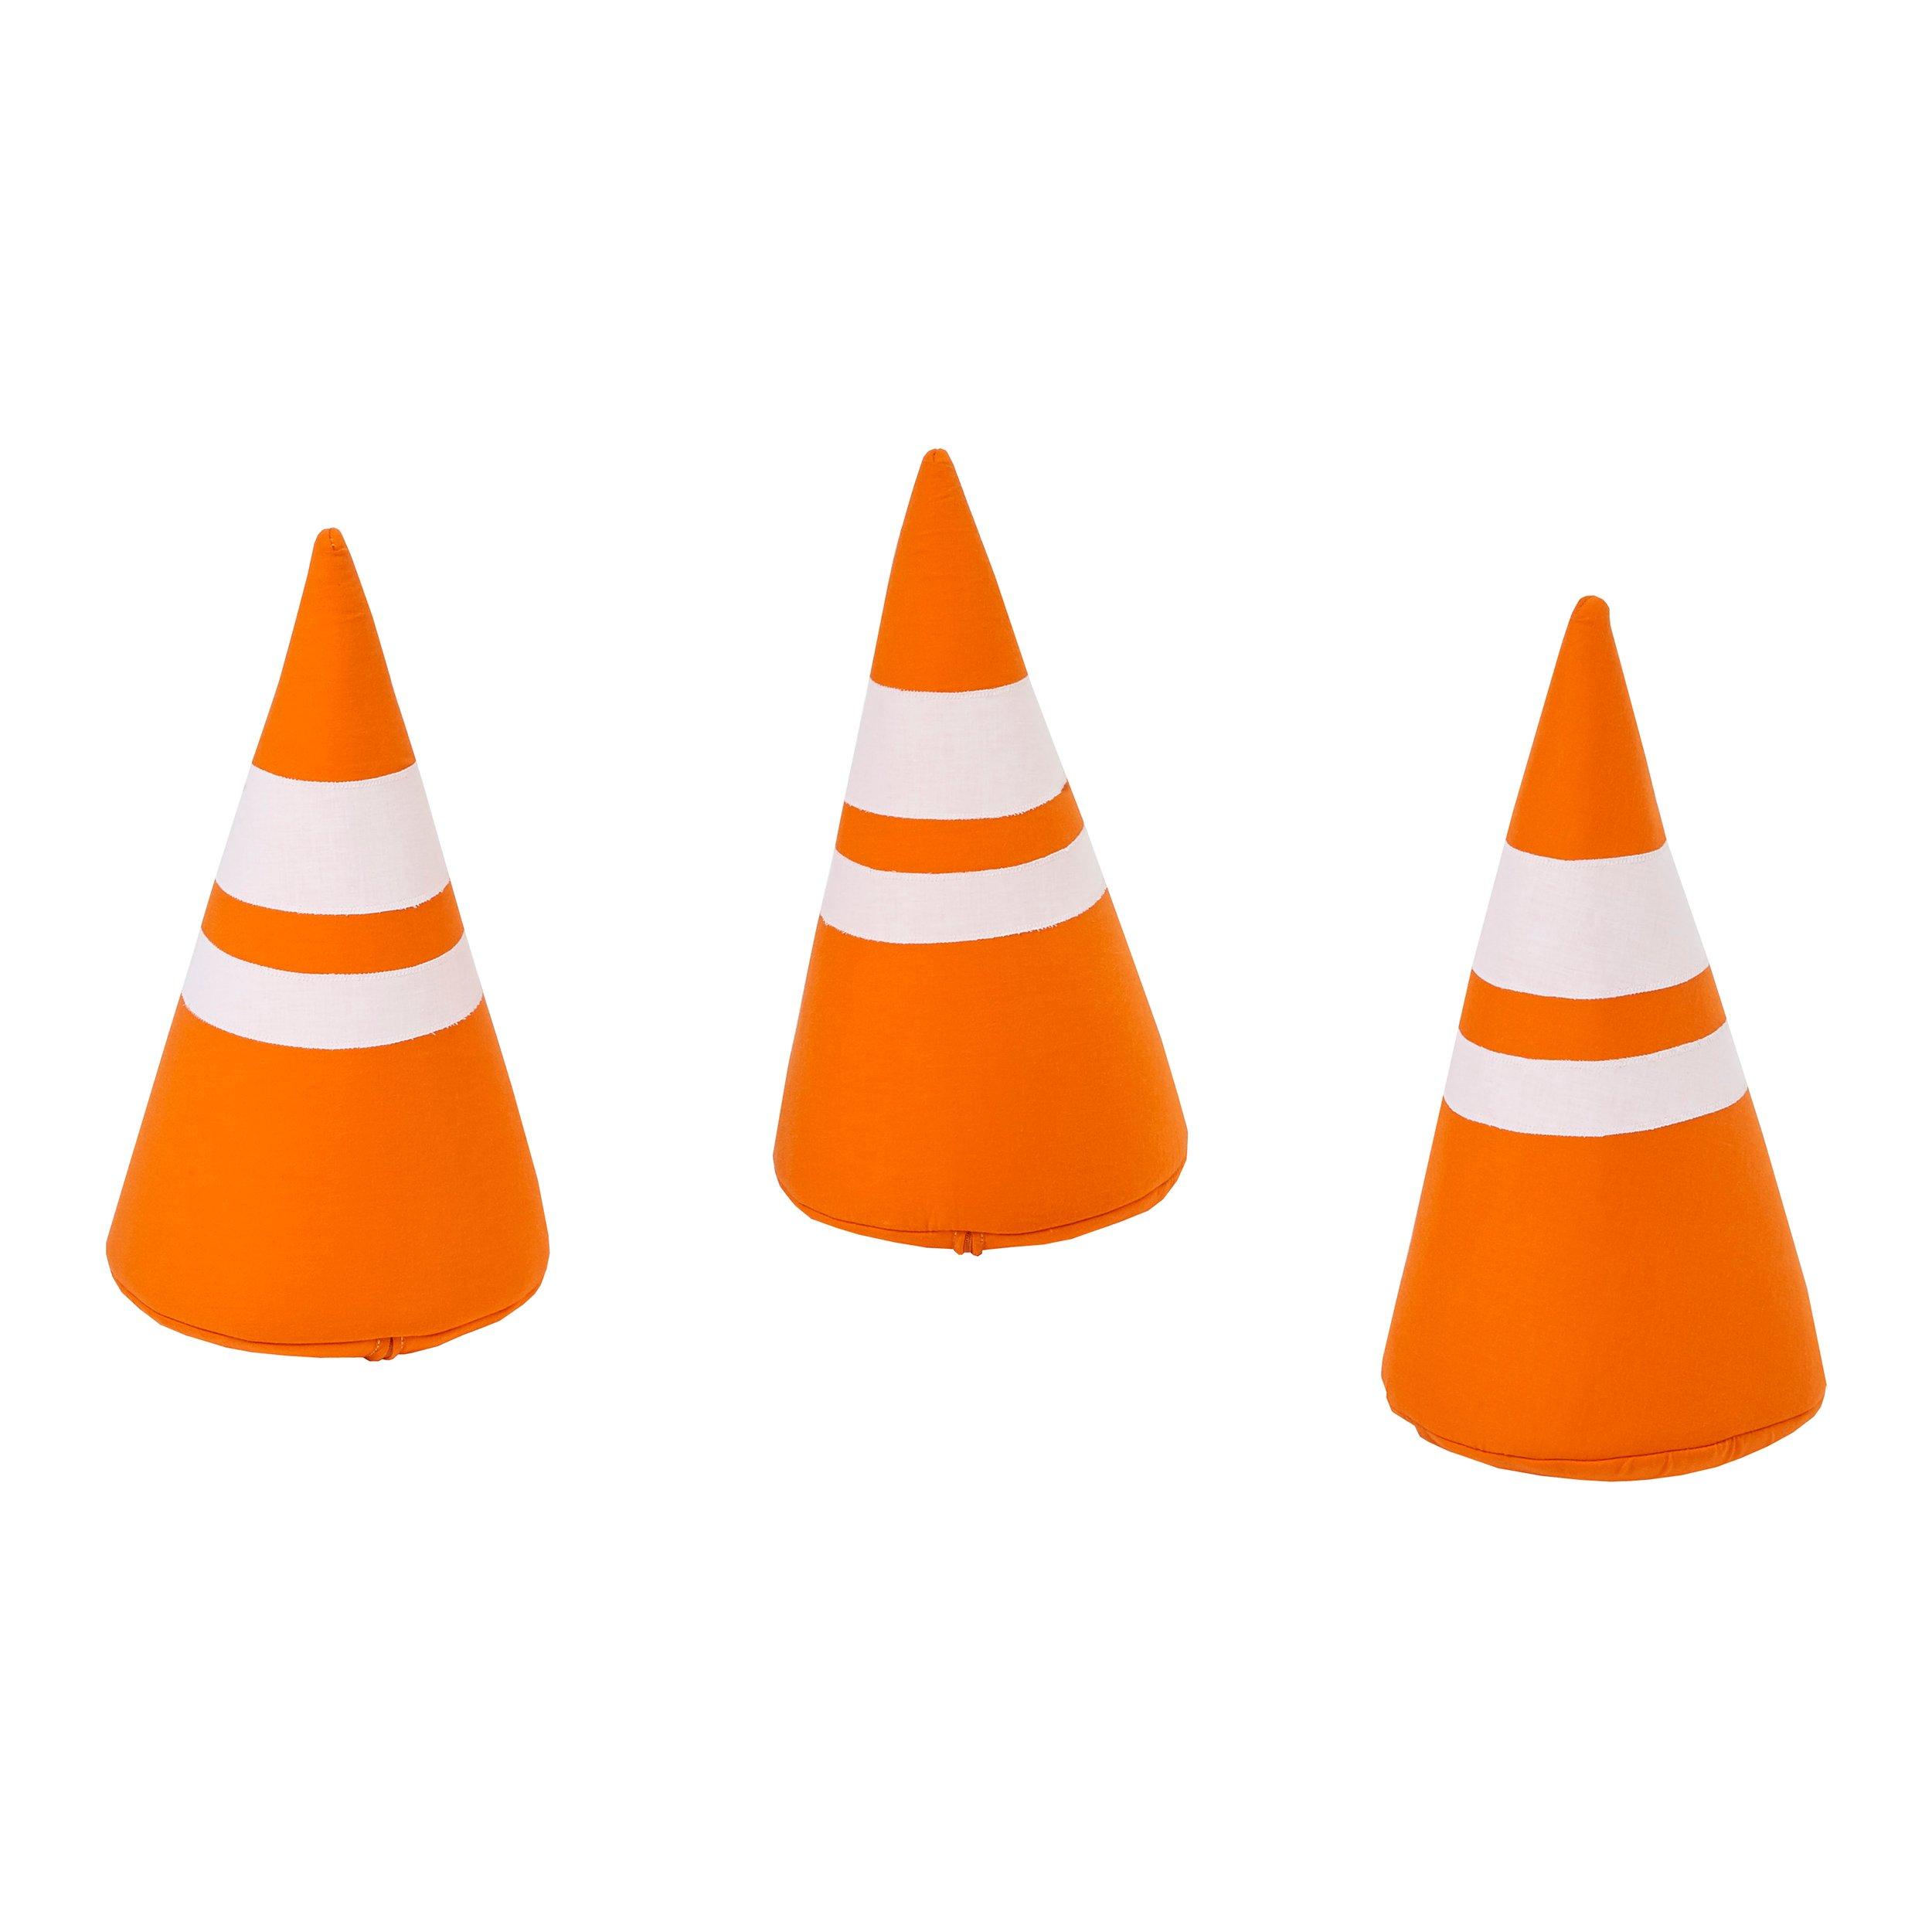 Hoppekids - Construction Cone Set